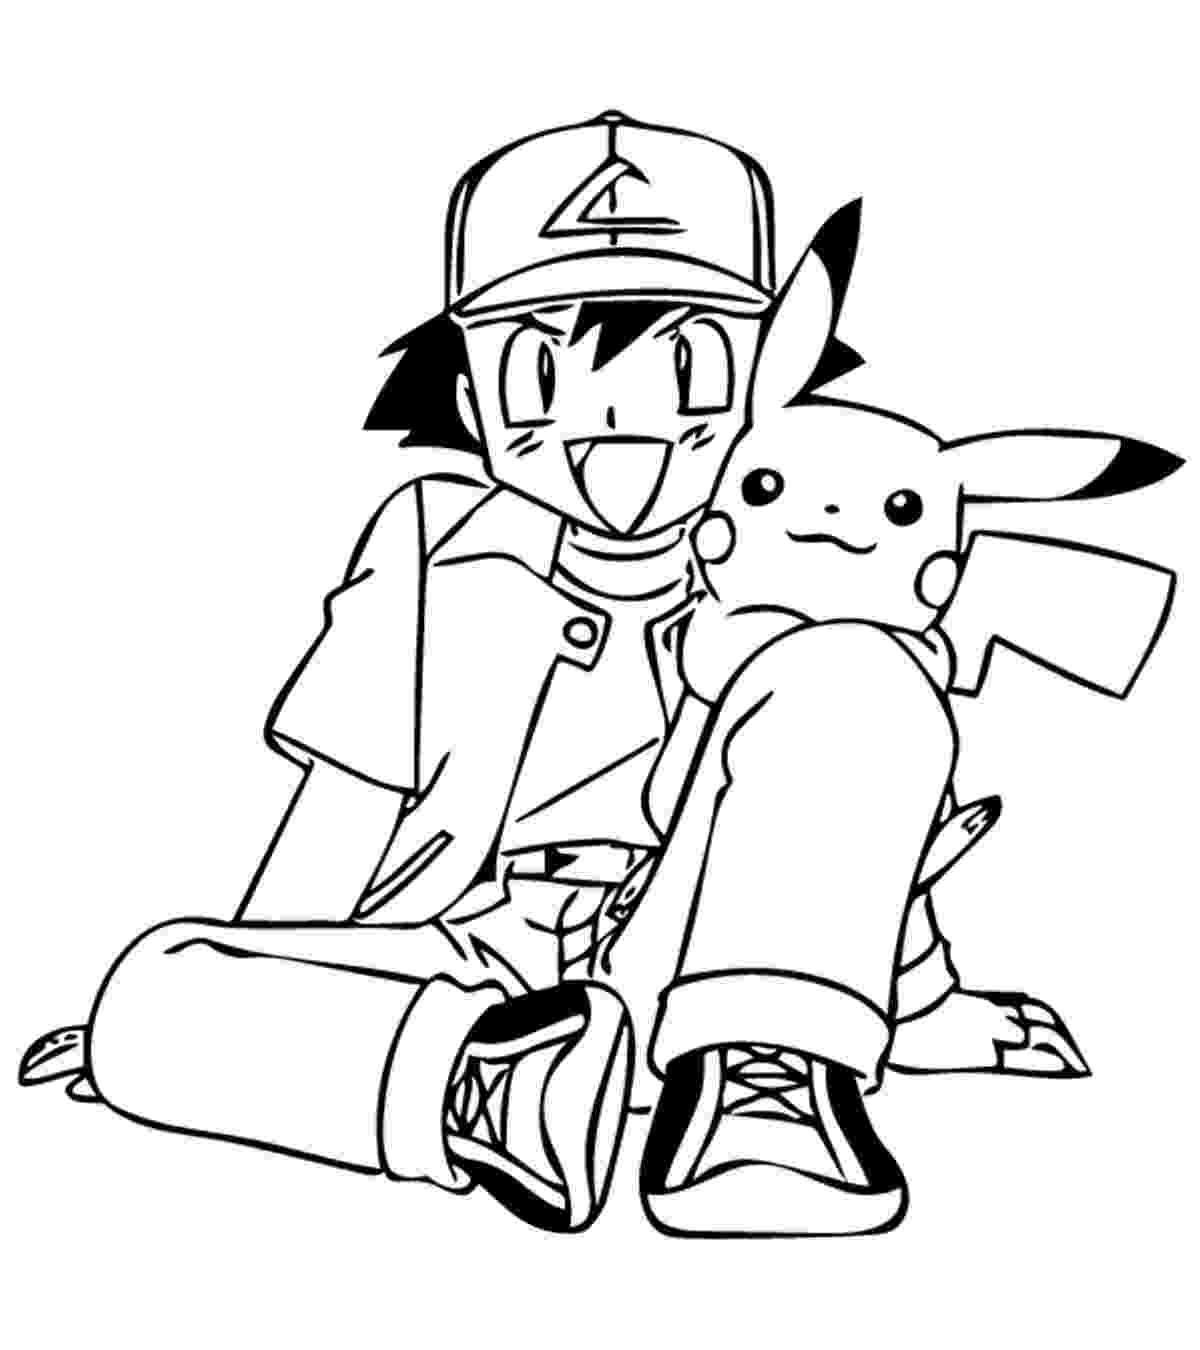 pokemon pitchers 40 pokemon coloring pages for kids visual arts ideas pitchers pokemon